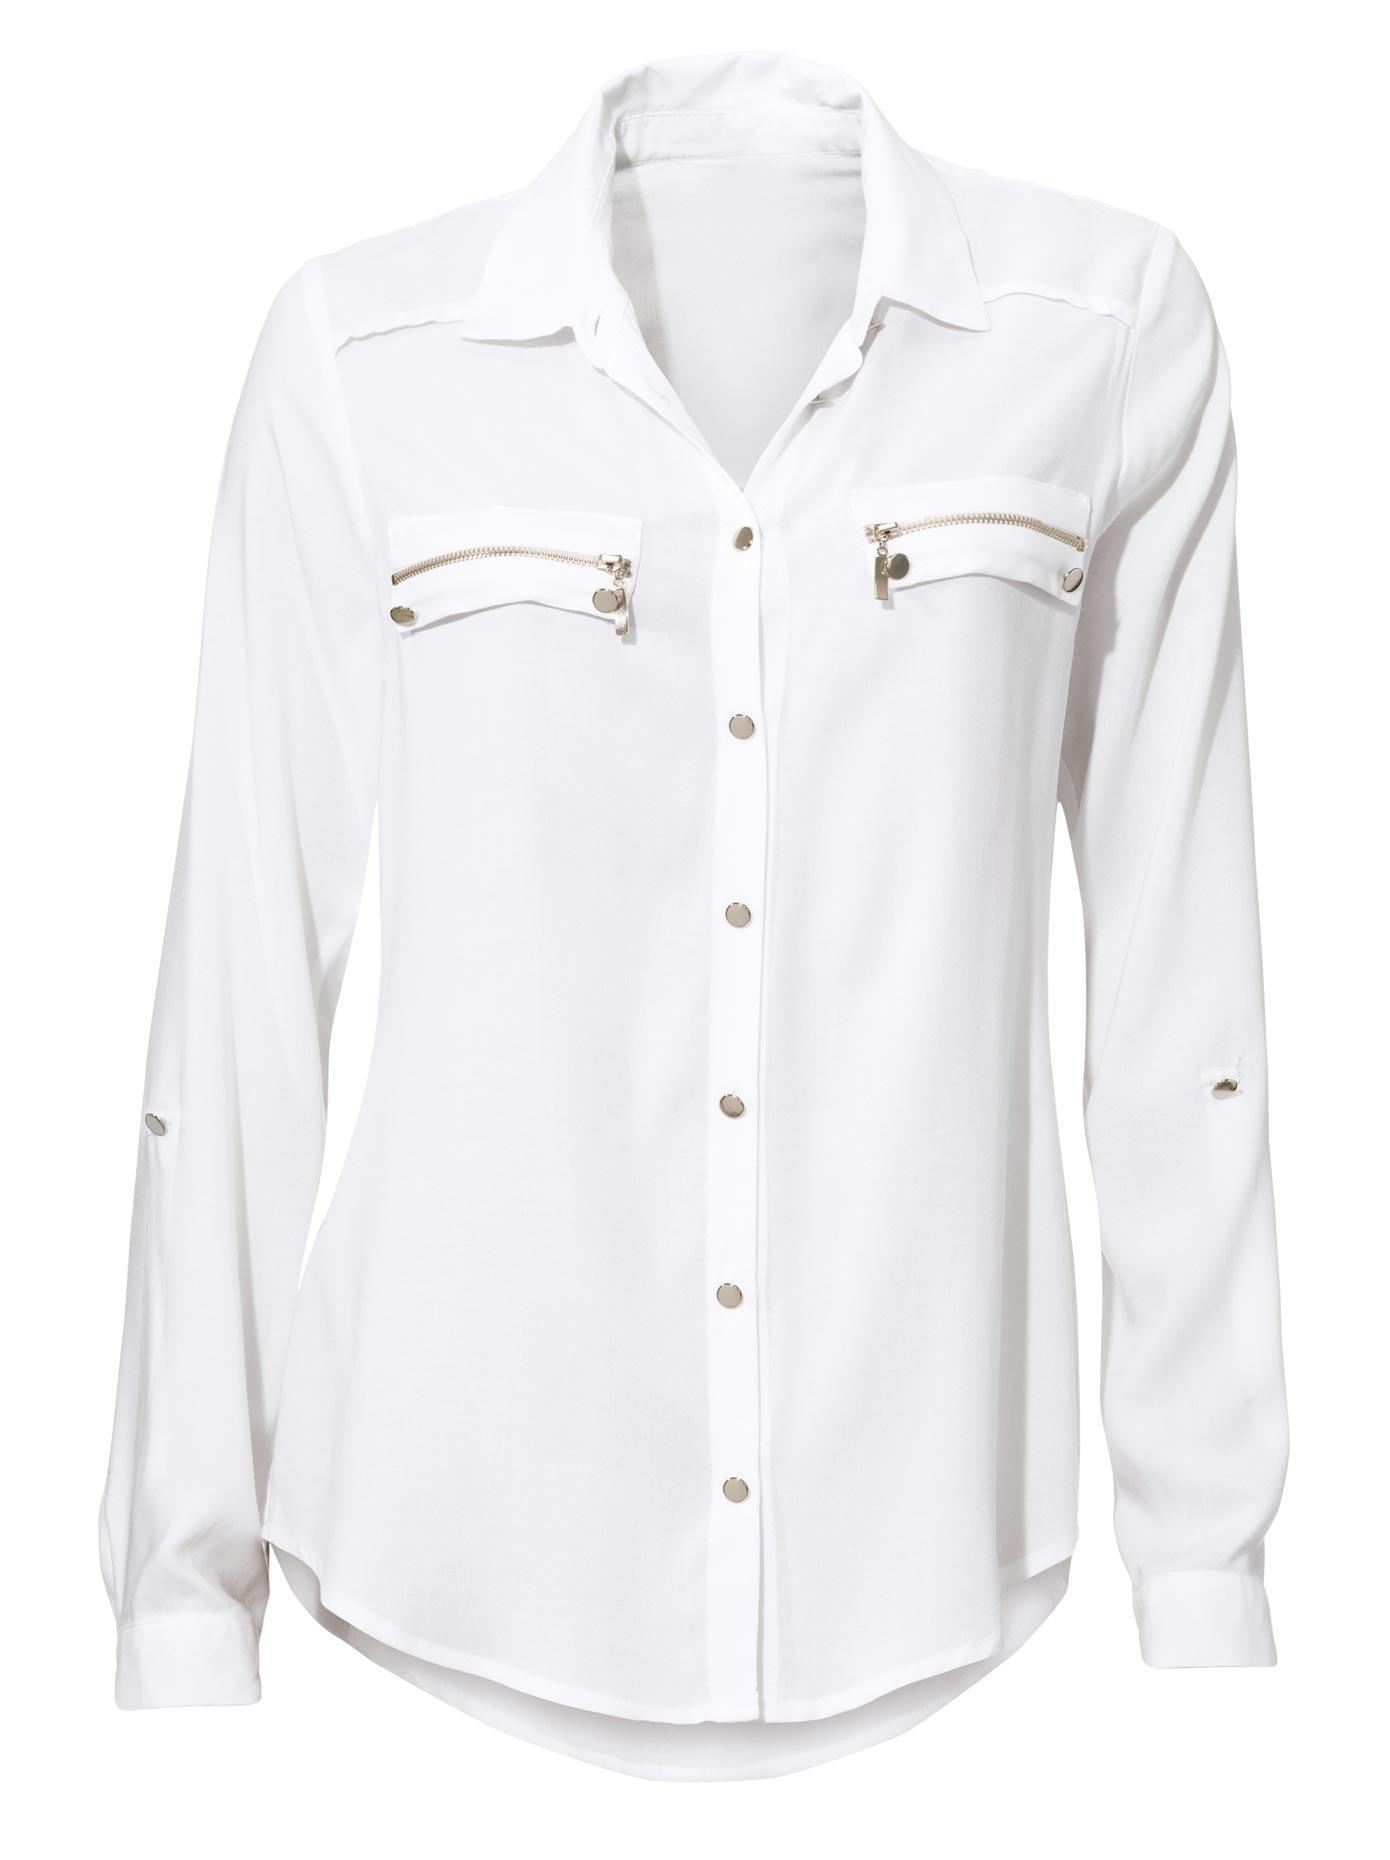 RICK CARDONA by Heine Overhemdblouse bij OTTO online kopen